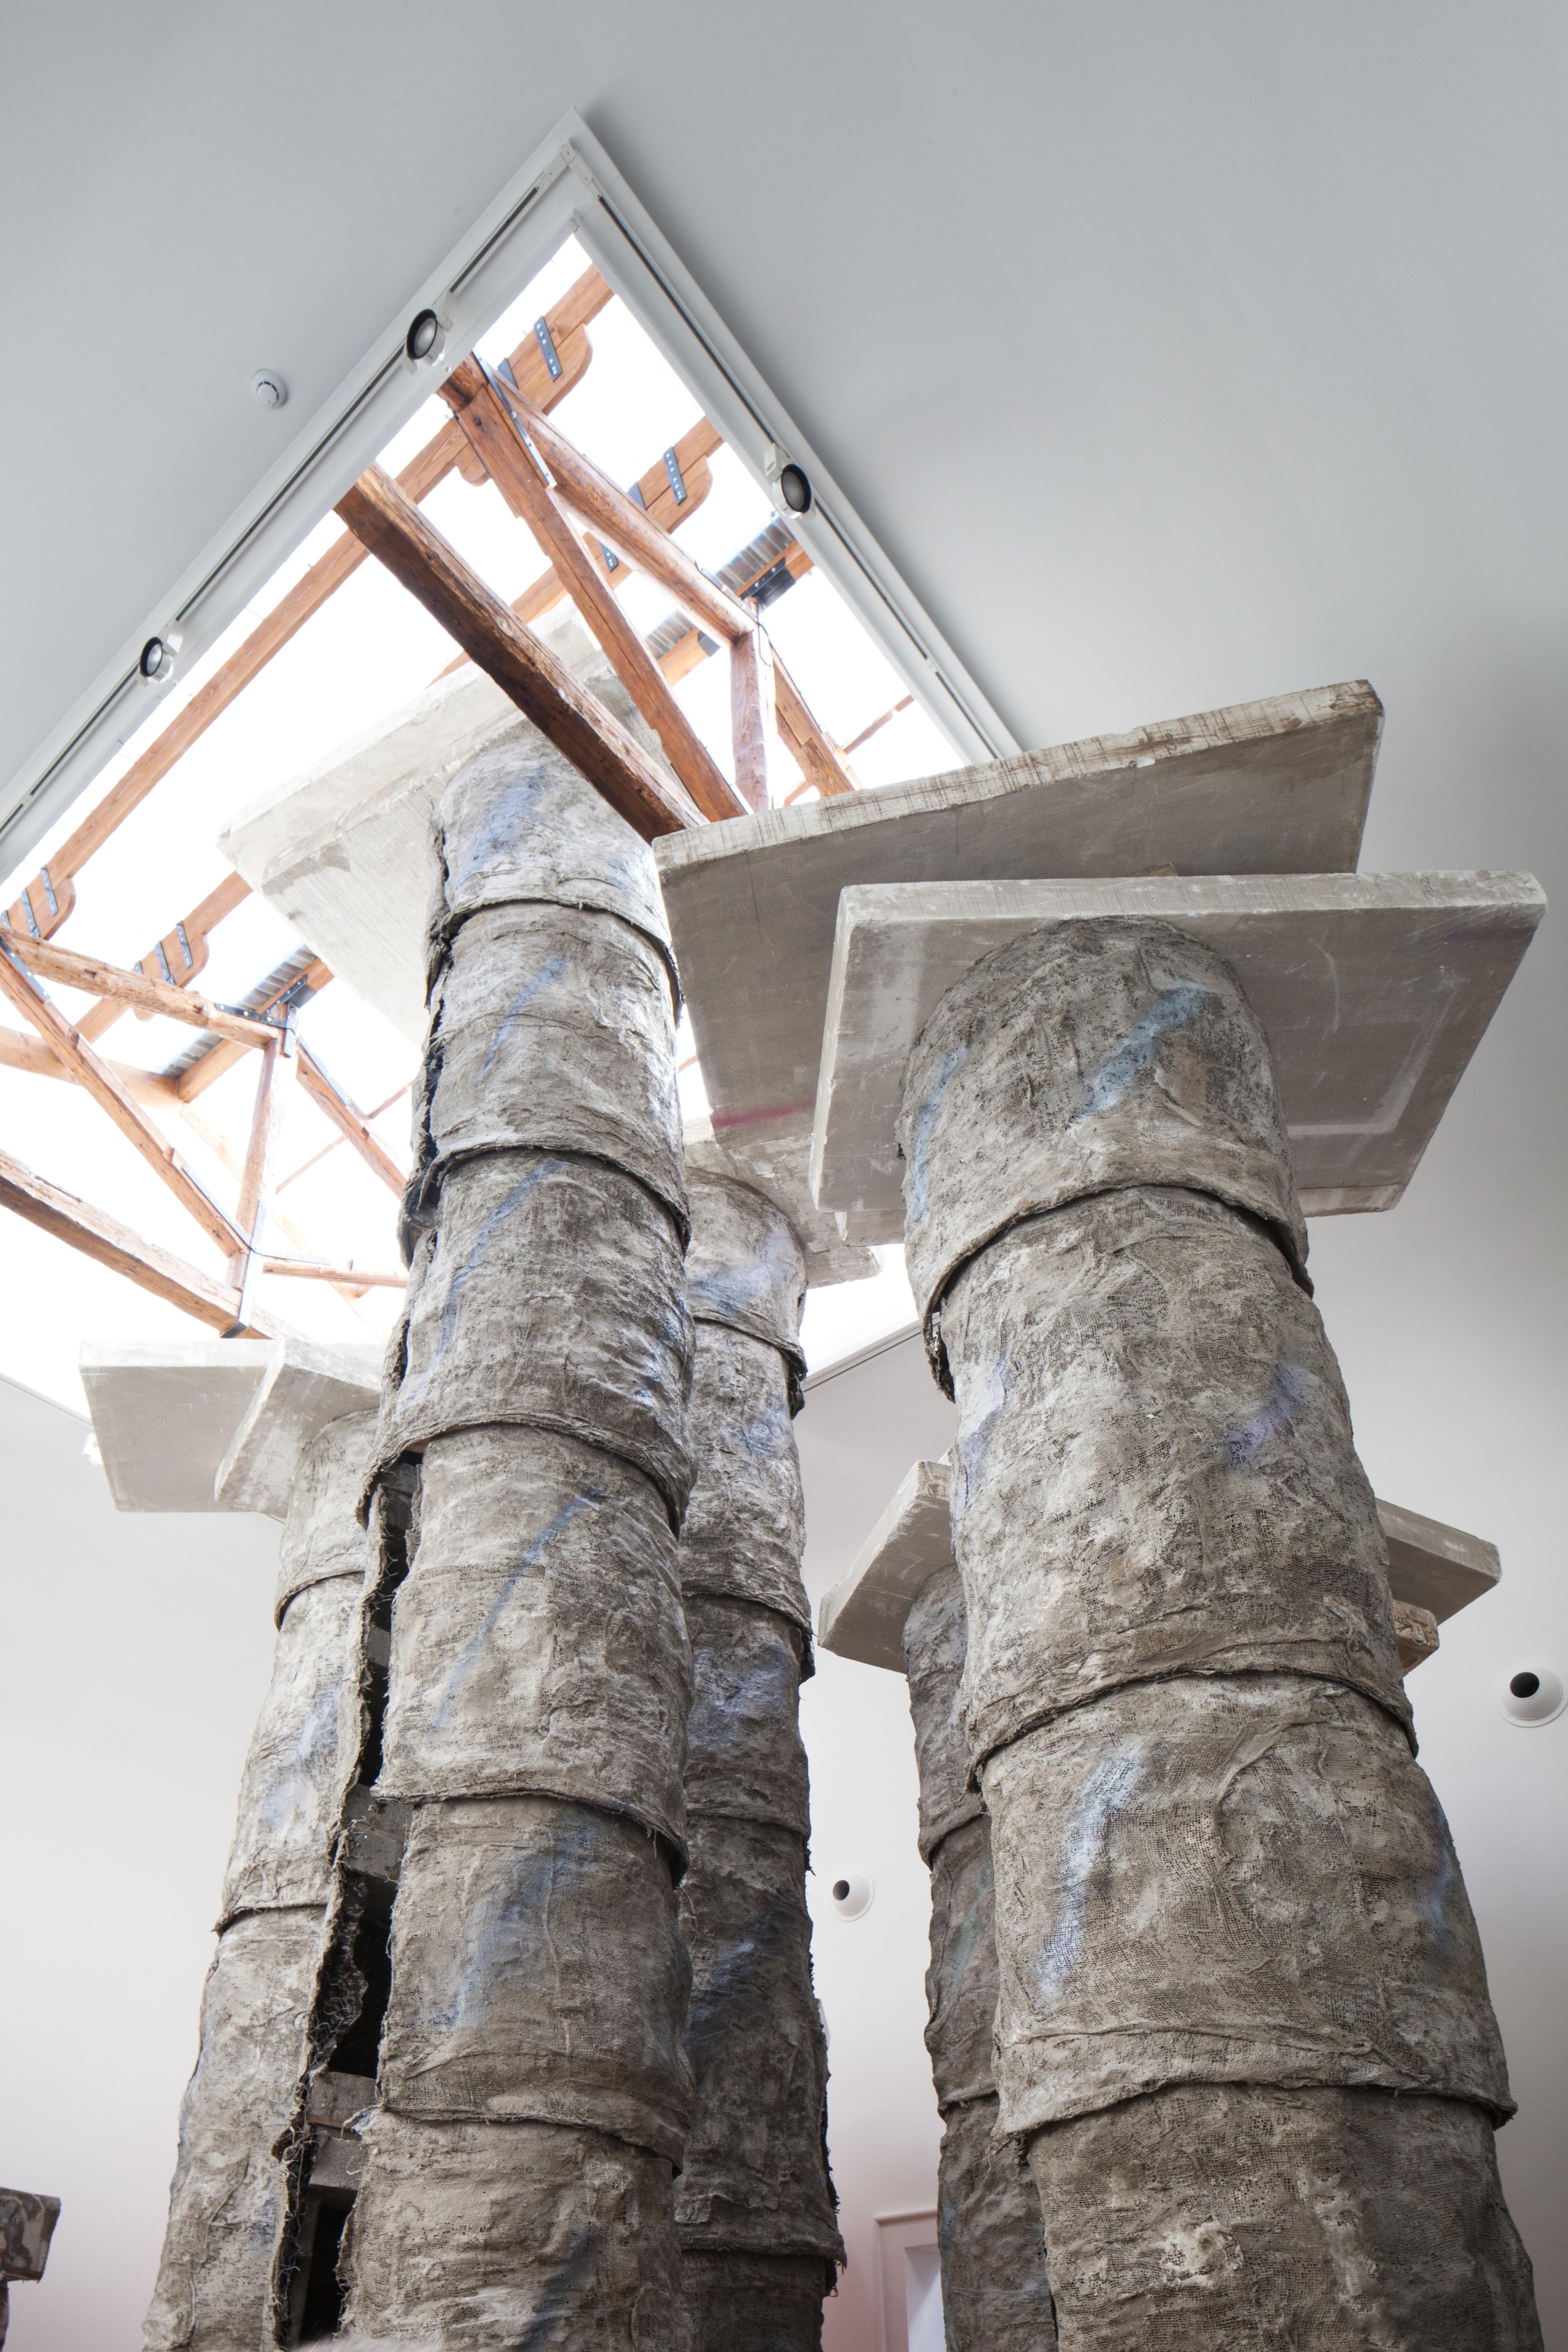 Павилион на Великобритания, Филида Барлоу, folly. Фото: Франческо Галли. Courtesy: La Biennale di Venezia